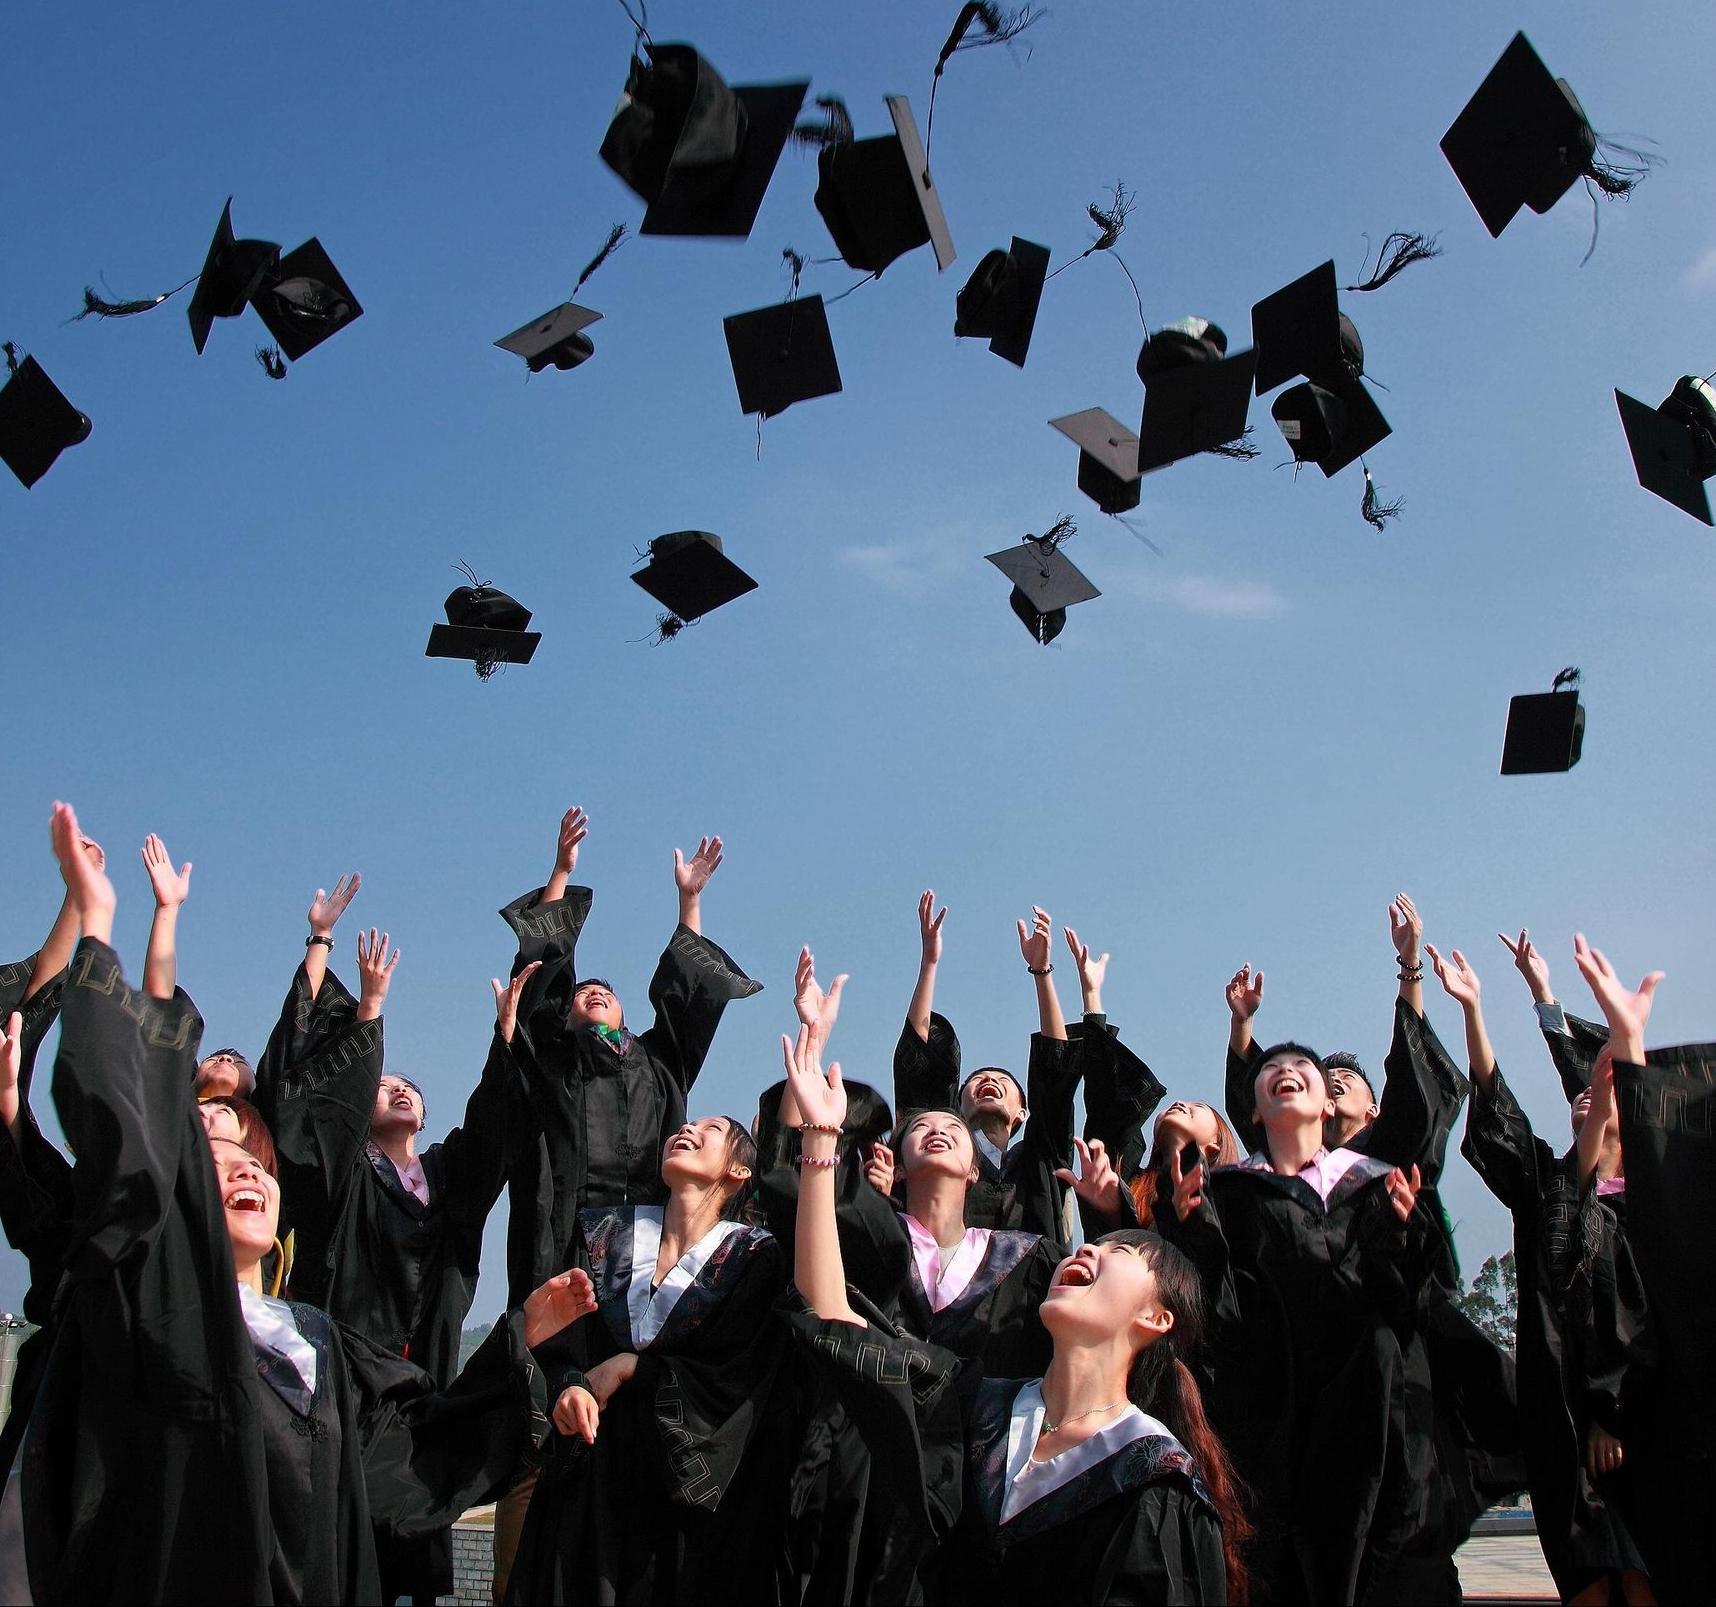 Congratulations on your graduation!  -